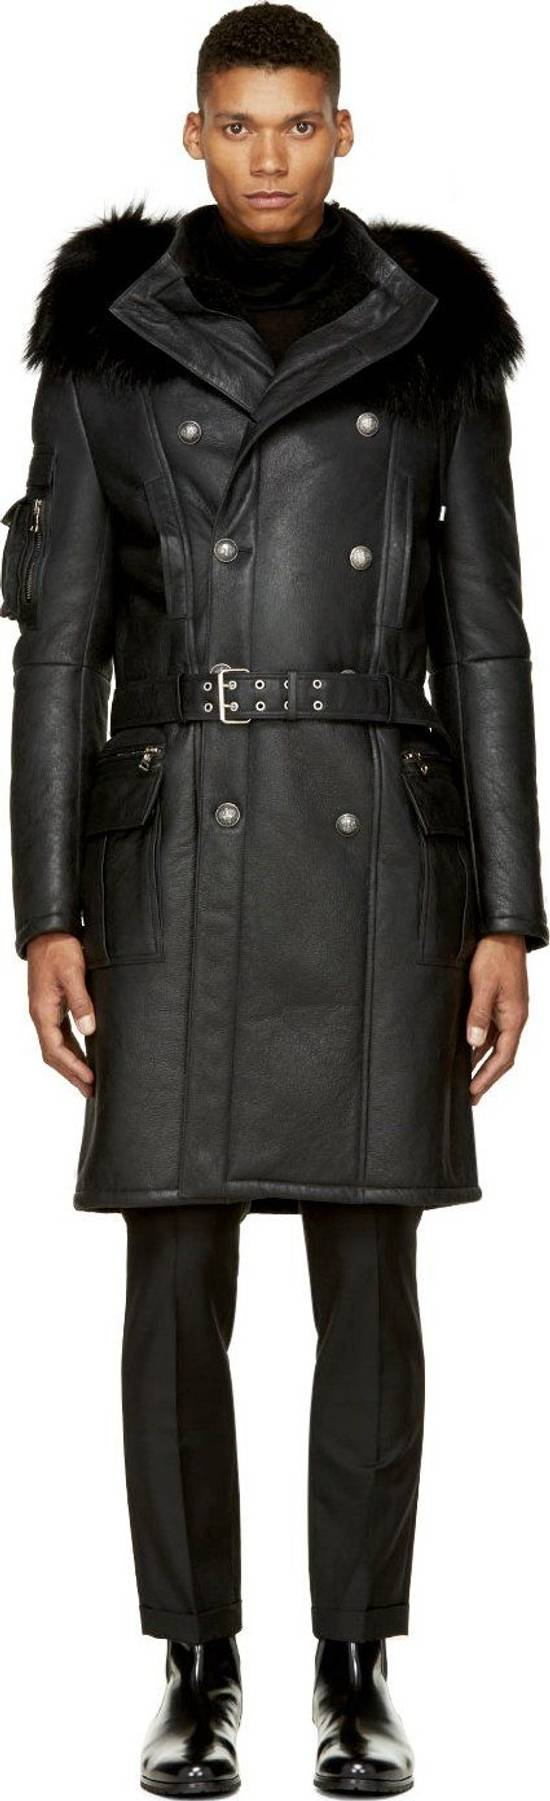 Balmain Balmain Leather Shearling Fur Parka Black Size Small 46-48 Coat Military Size US S / EU 44-46 / 1 - 1